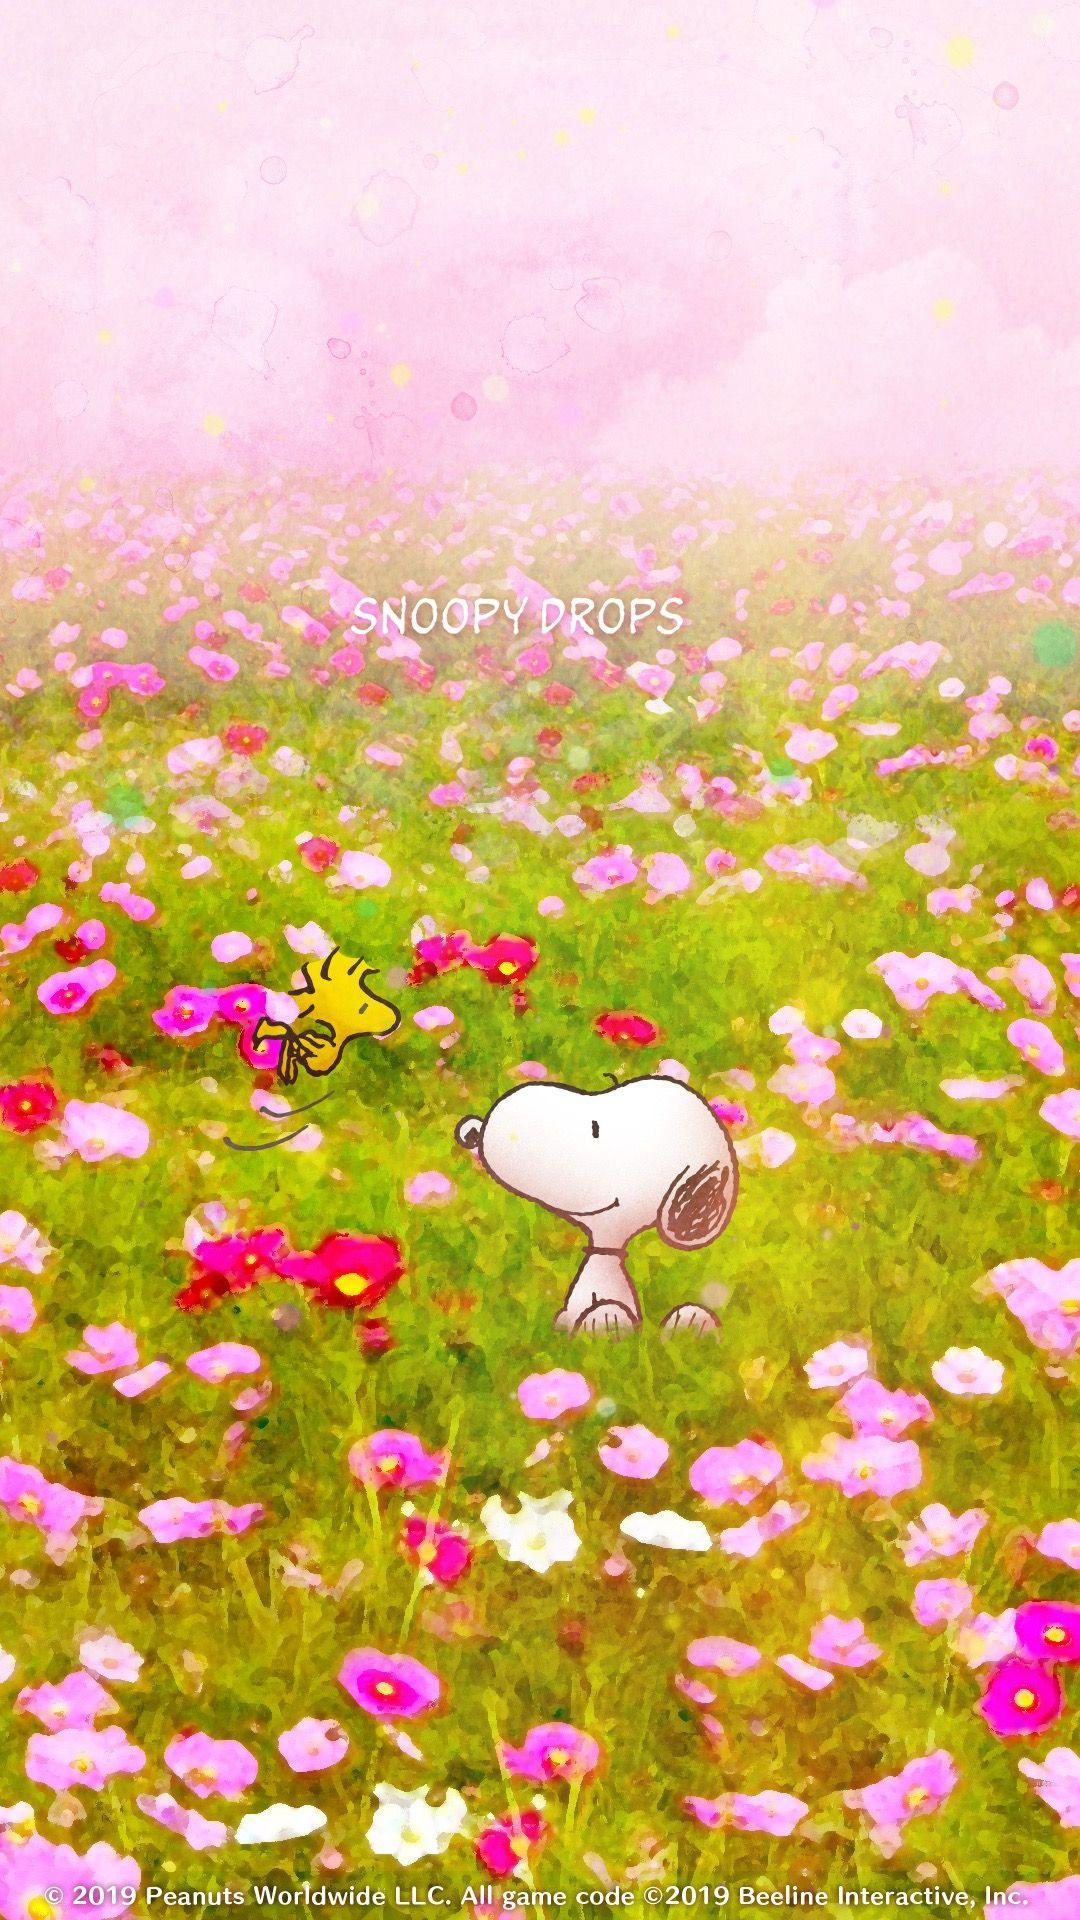 Snoopy スヌーピー コスモス畑 スヌーピーの壁紙 壁紙アート